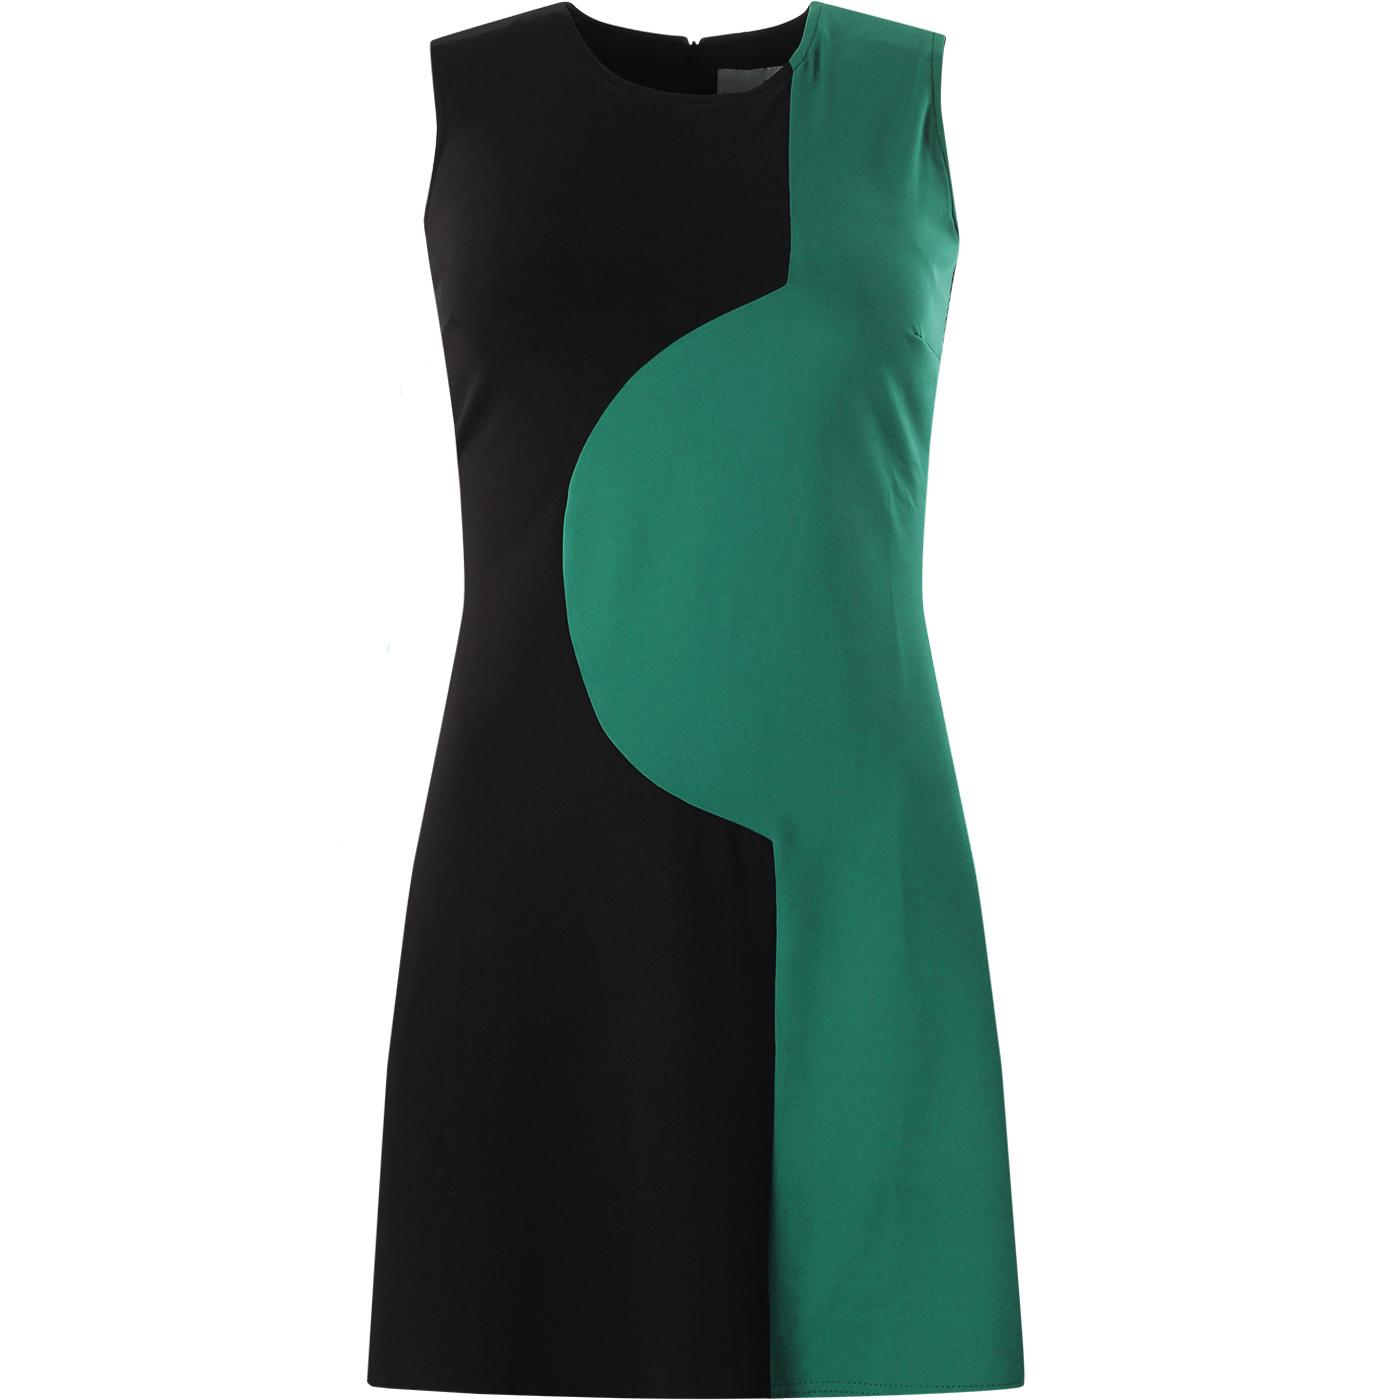 Golightly MADCAP ENGLAND 60s Mod 2-Tone Dress B/T